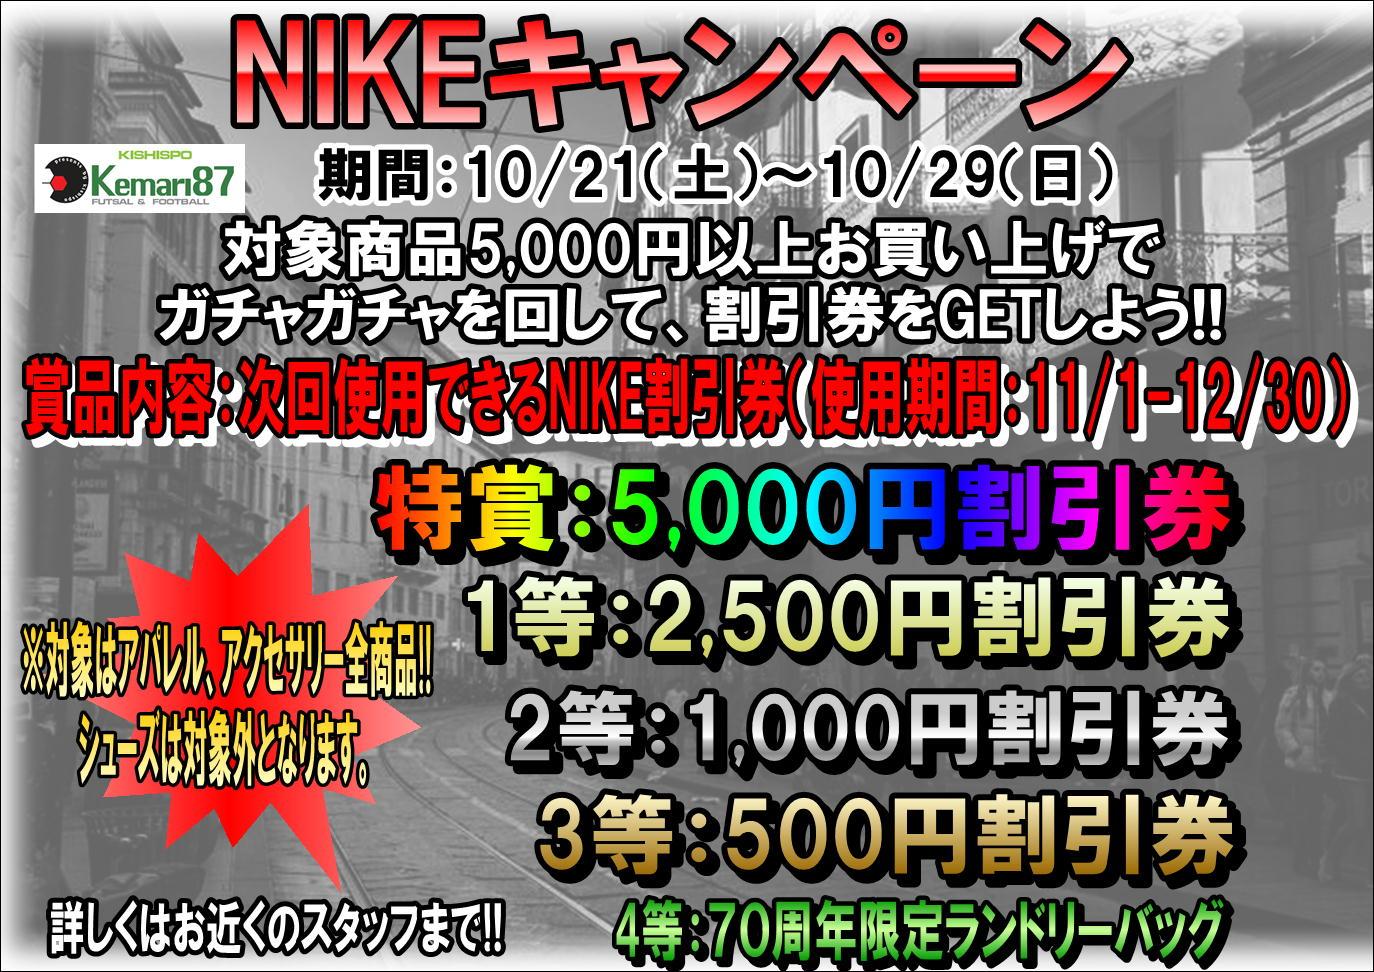 【NIKEキャンペーン開催!!】